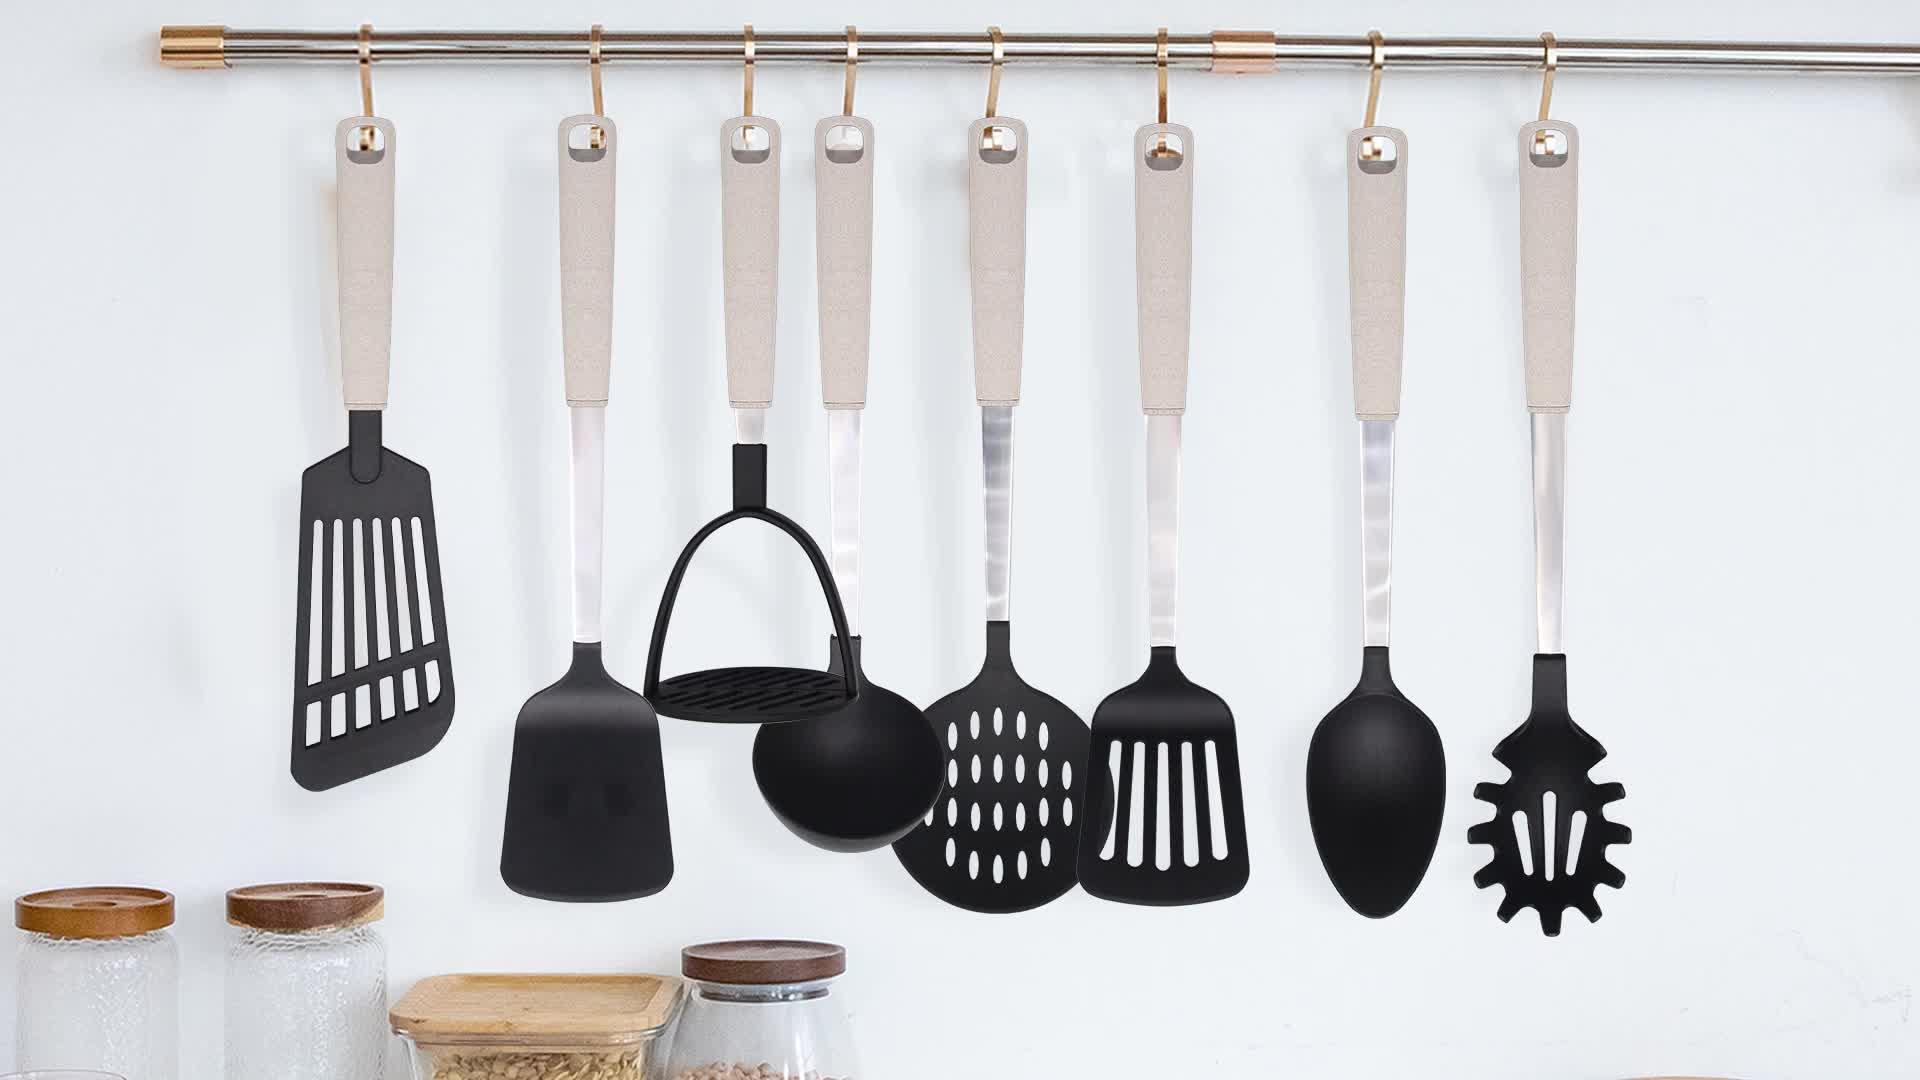 Best Selling! 8 Pcs Kitchen Tools Nylon Material Kitchen Utensils New Material PVD Kitchen Tool Premium Stylish